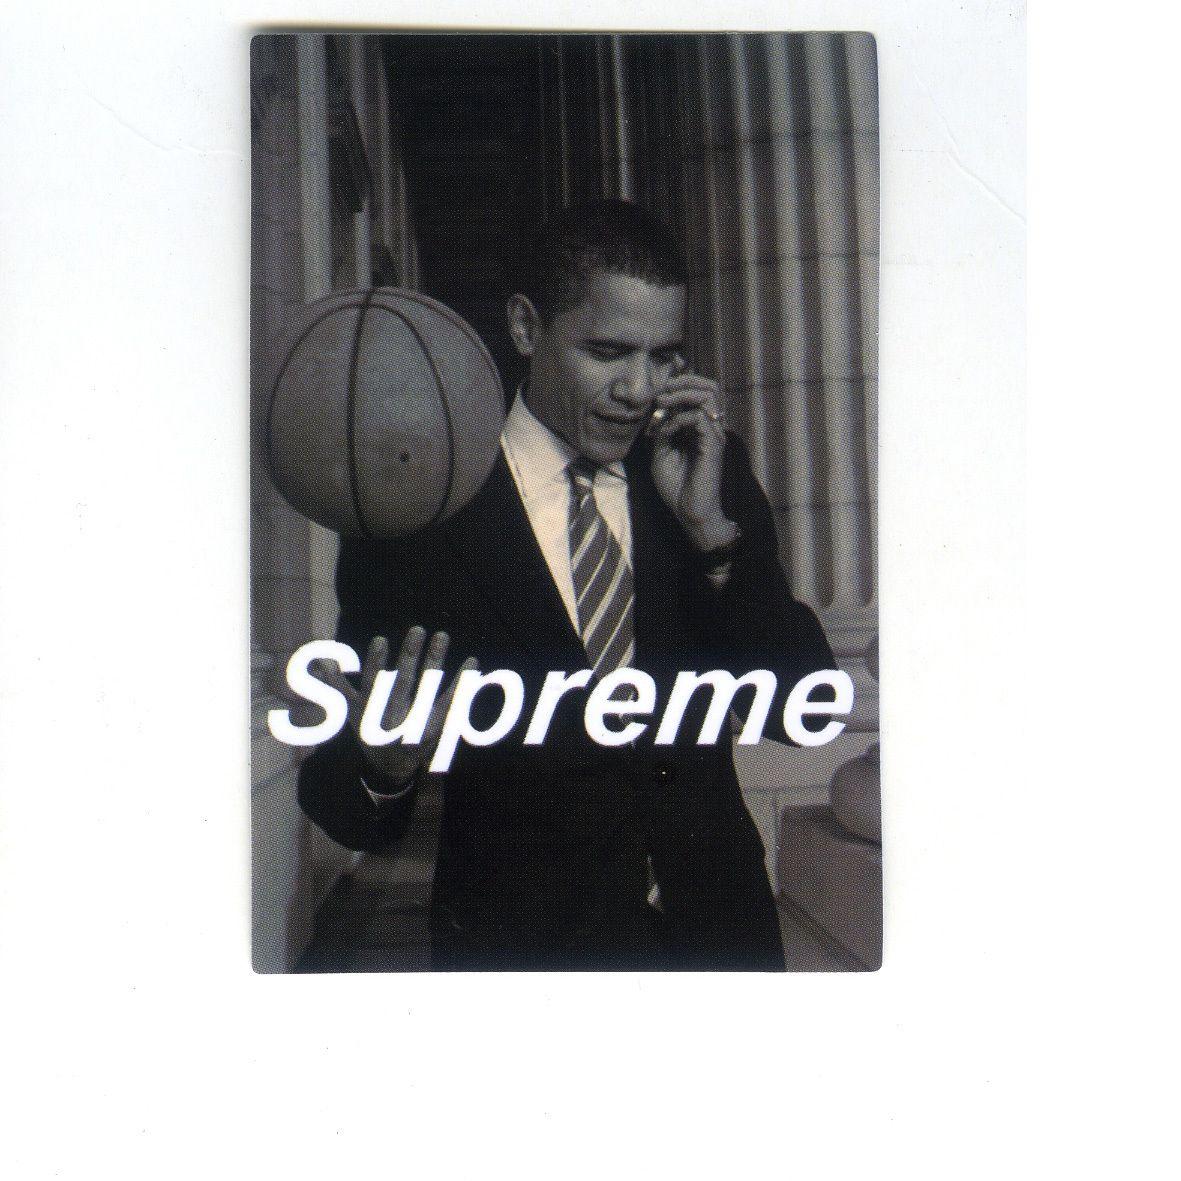 1441 Supreme President Obama Playing Basketball 8 Cm Decal Sticker Supreme Wallpaper Supreme Iphone Wallpaper Hype Wallpaper